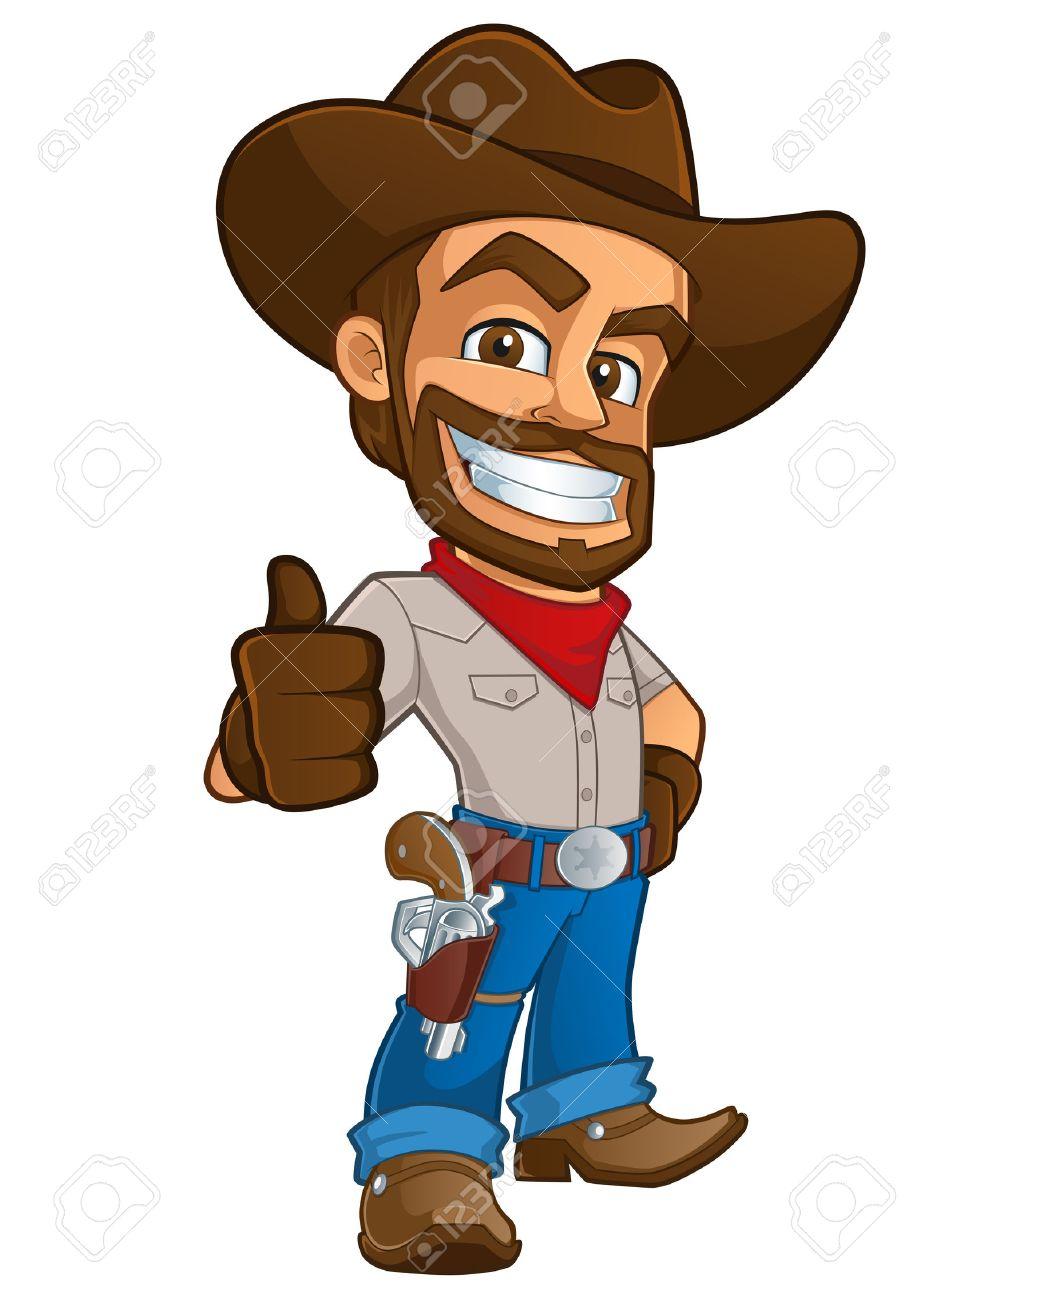 sympathetic cowboy hat, wears boots and a gun - 44068182